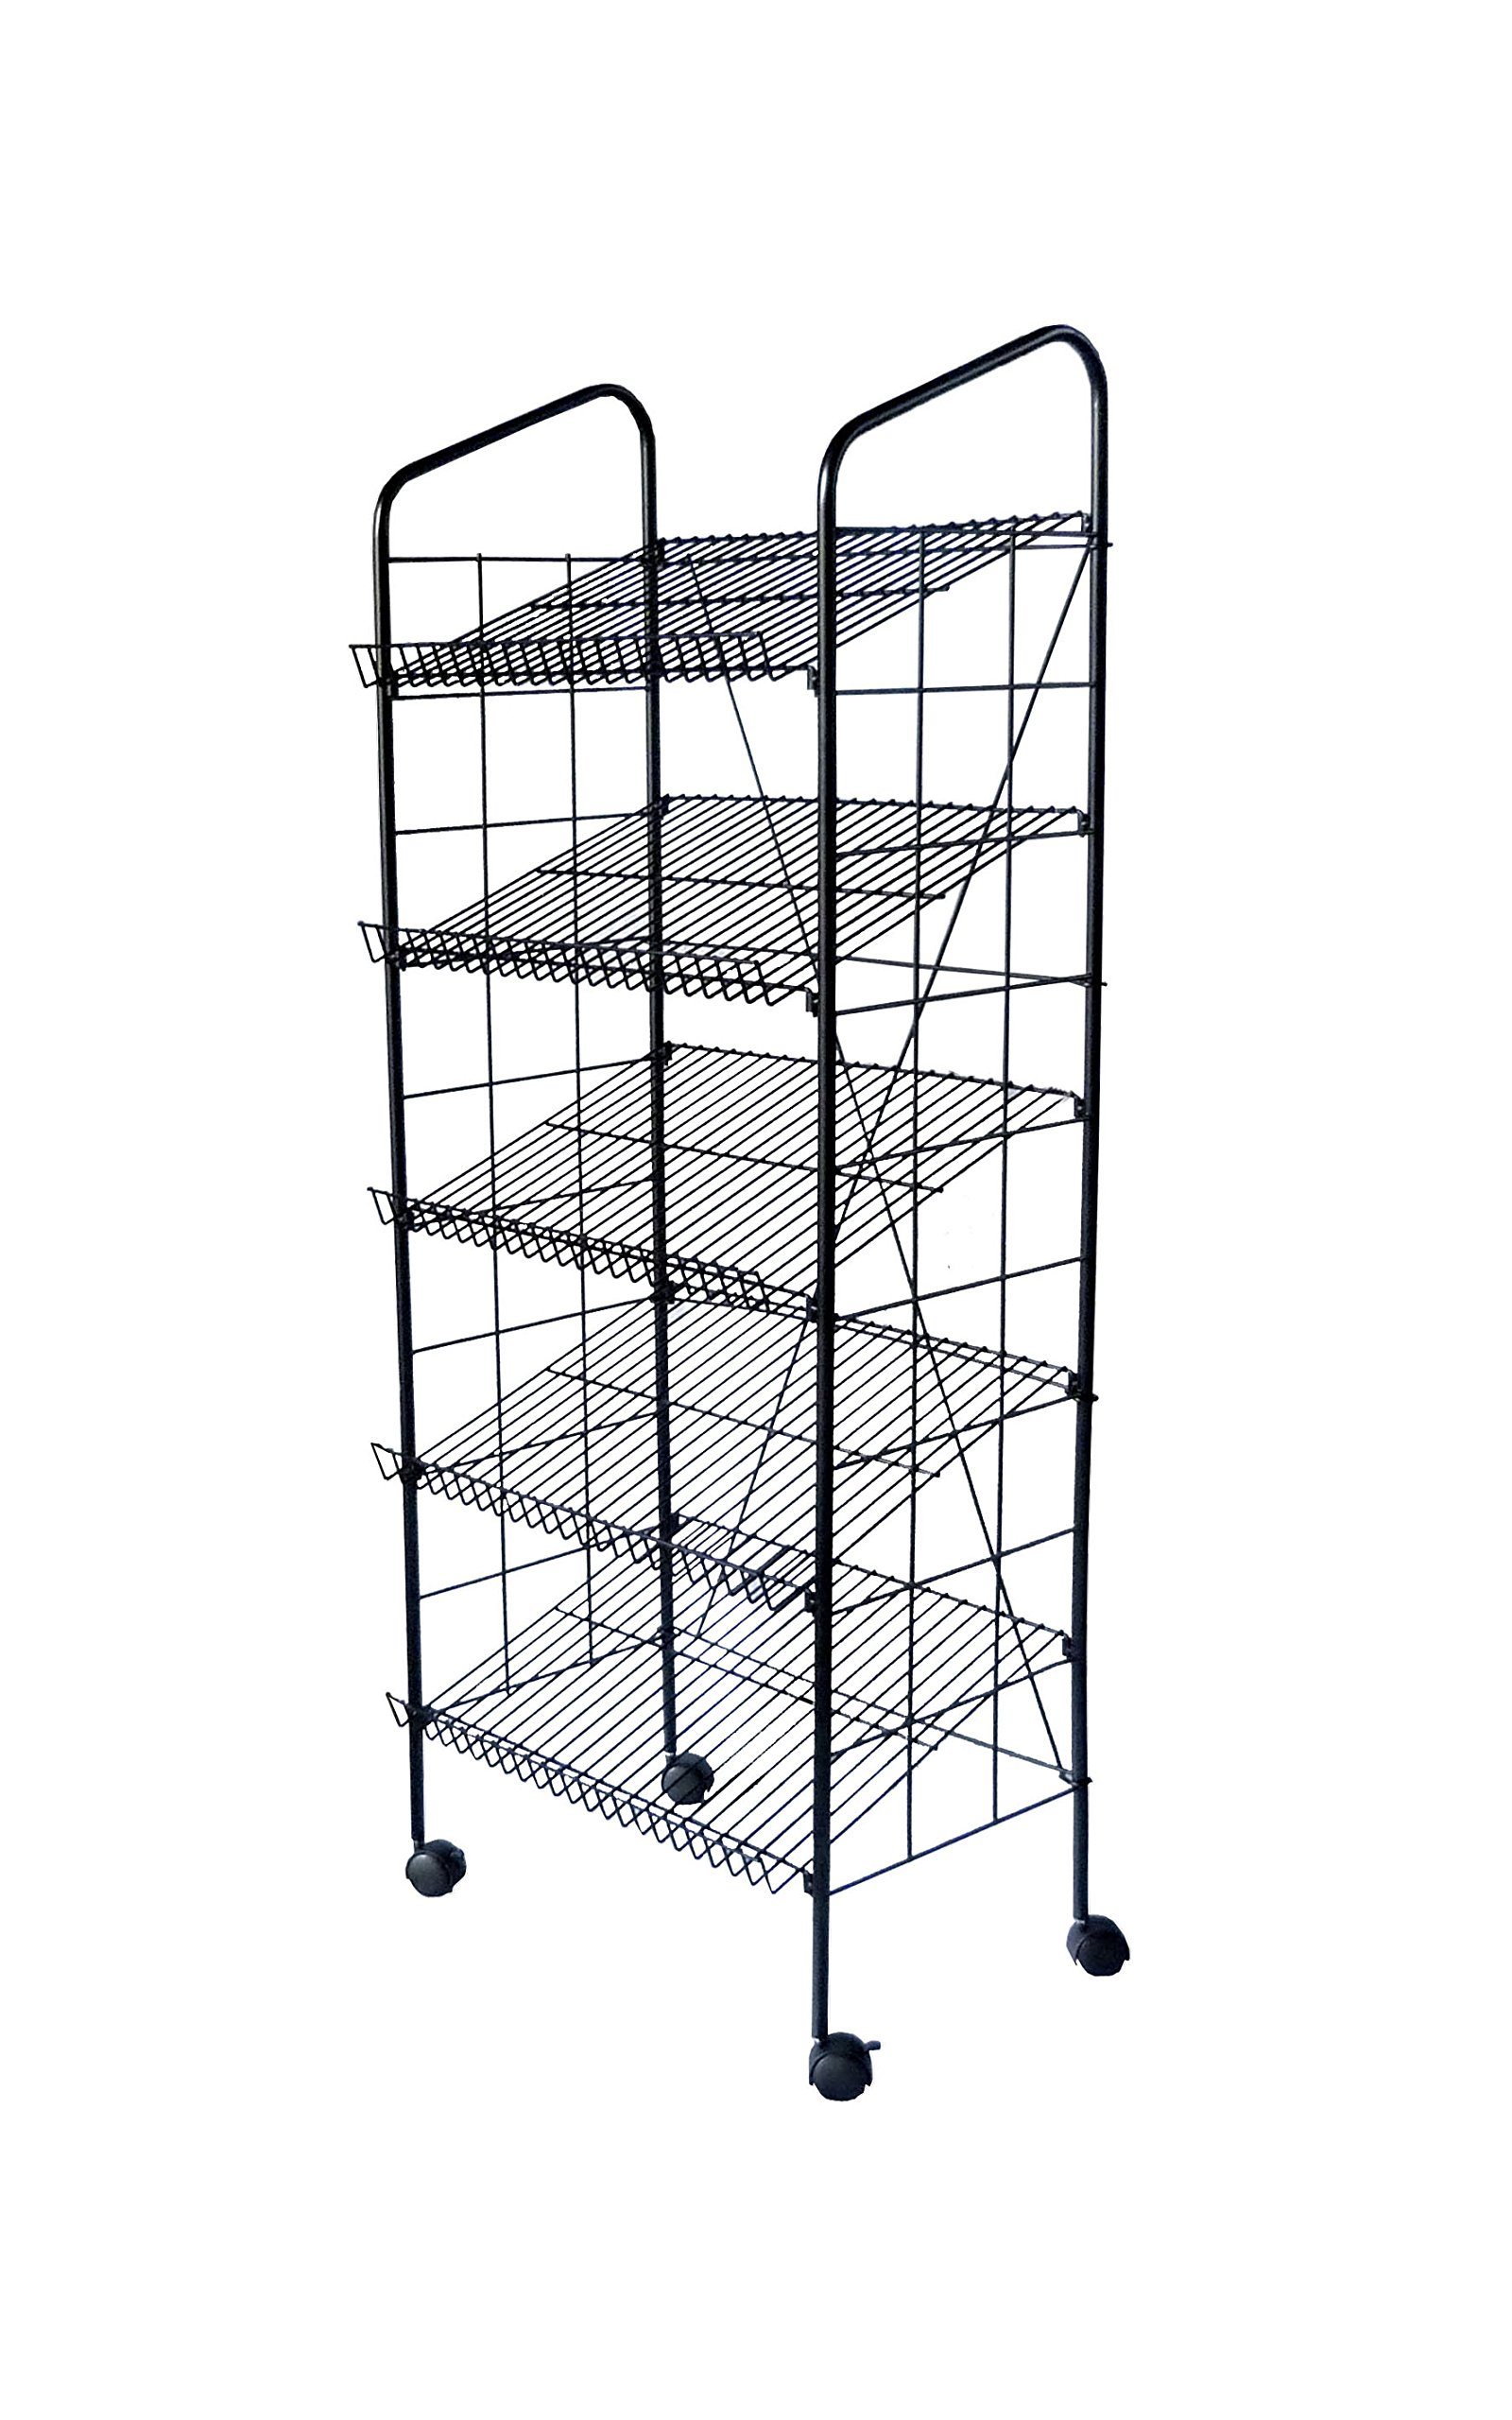 FixtureDisplays 24.3'' x 49.1'' x 14.7'' Bakery Display Rack w/ Wheels, 4 Wire Gravity Shelves, Mild Steel - Black 19406